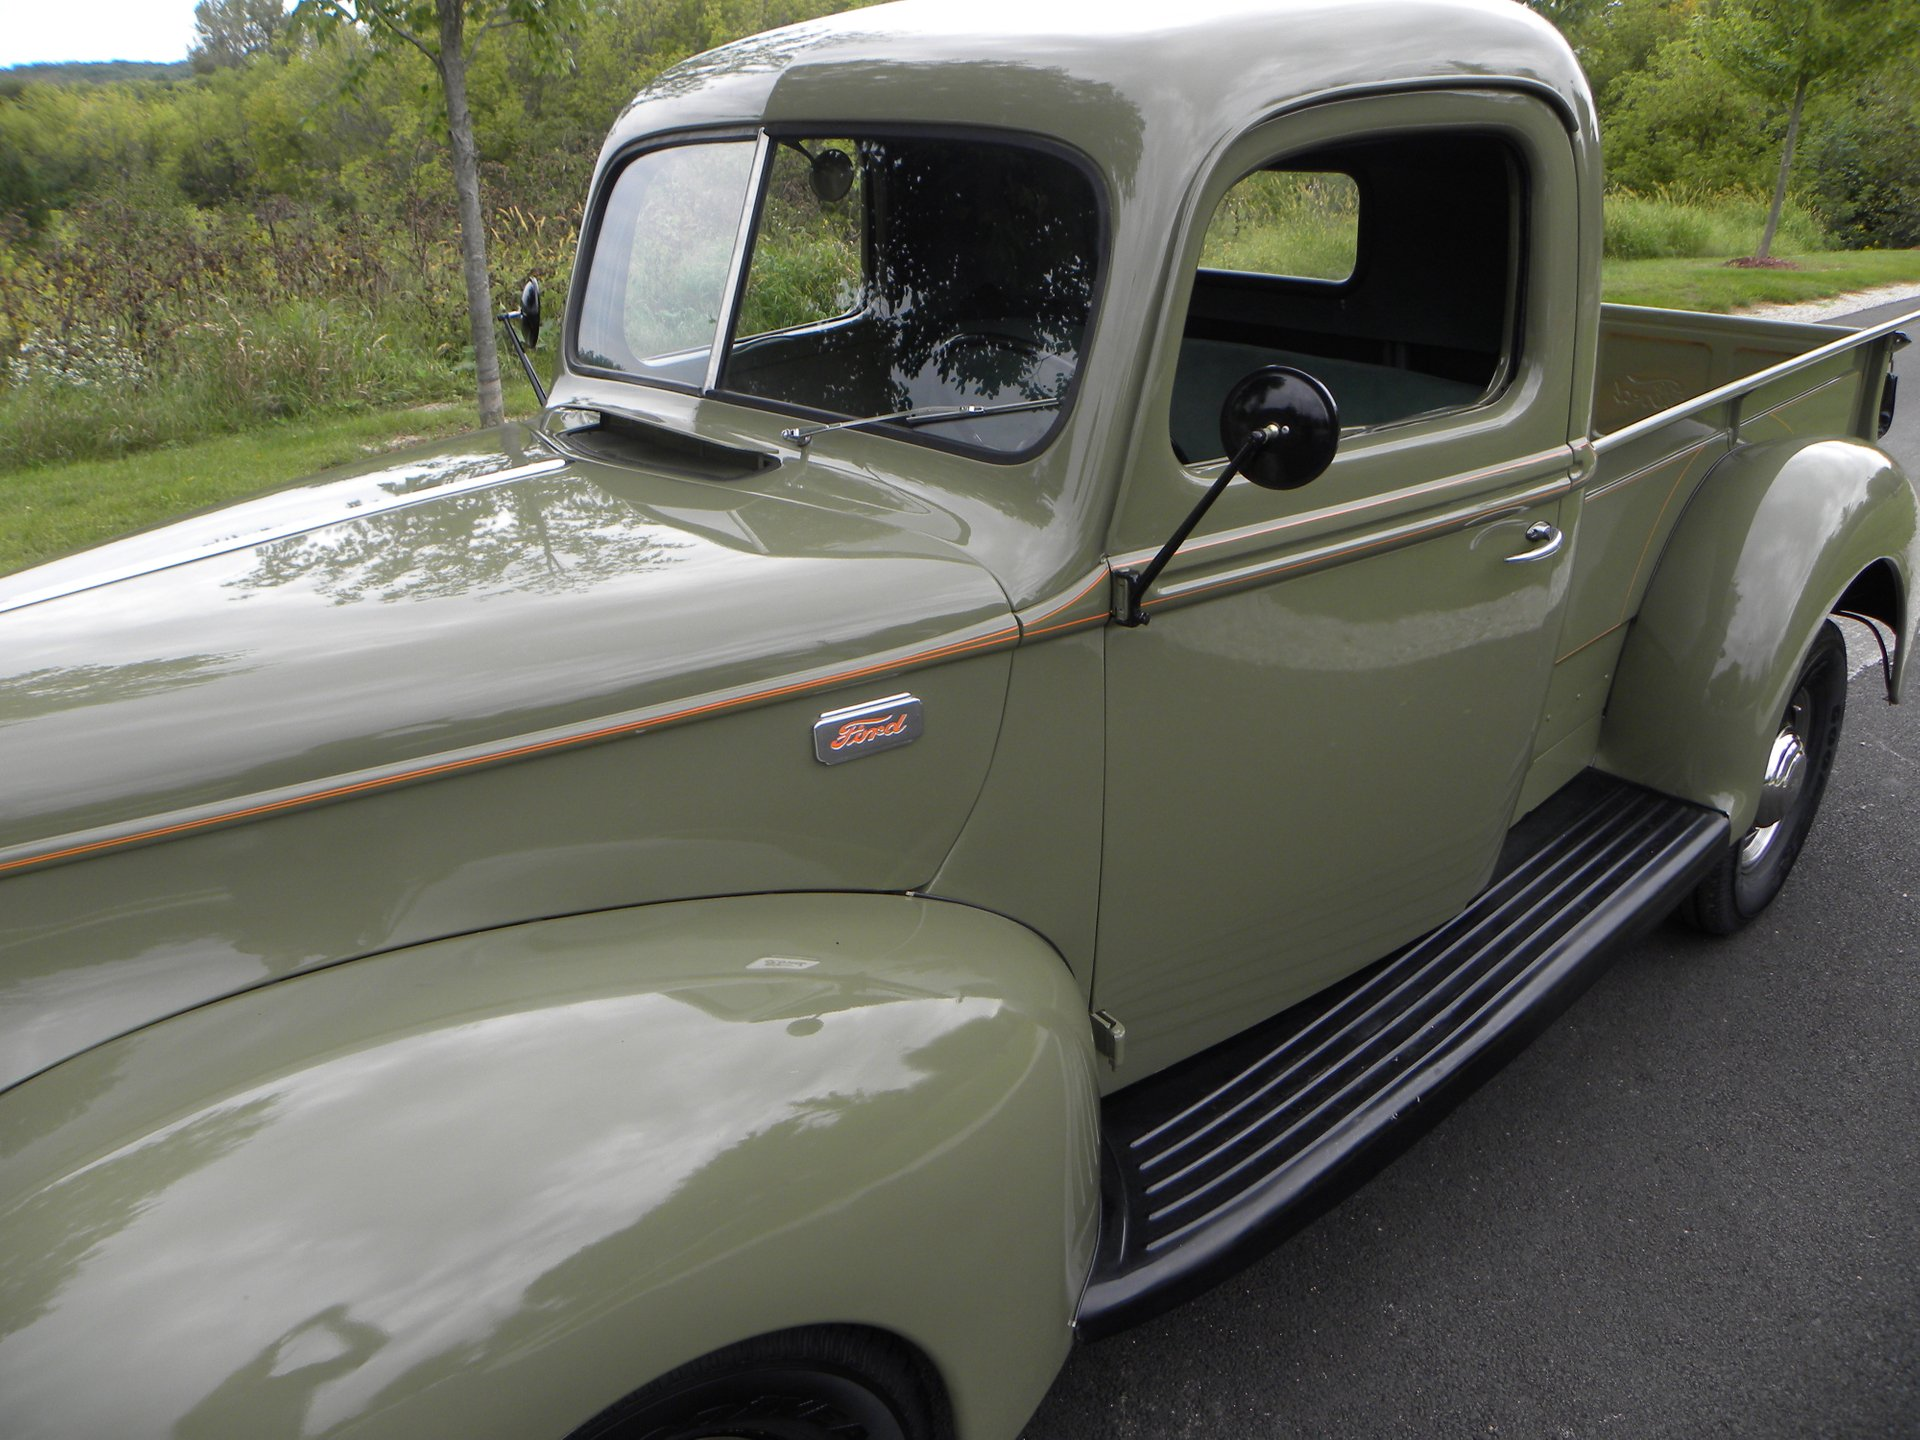 1941 Ford Berlin Motors Vin Location For Sale